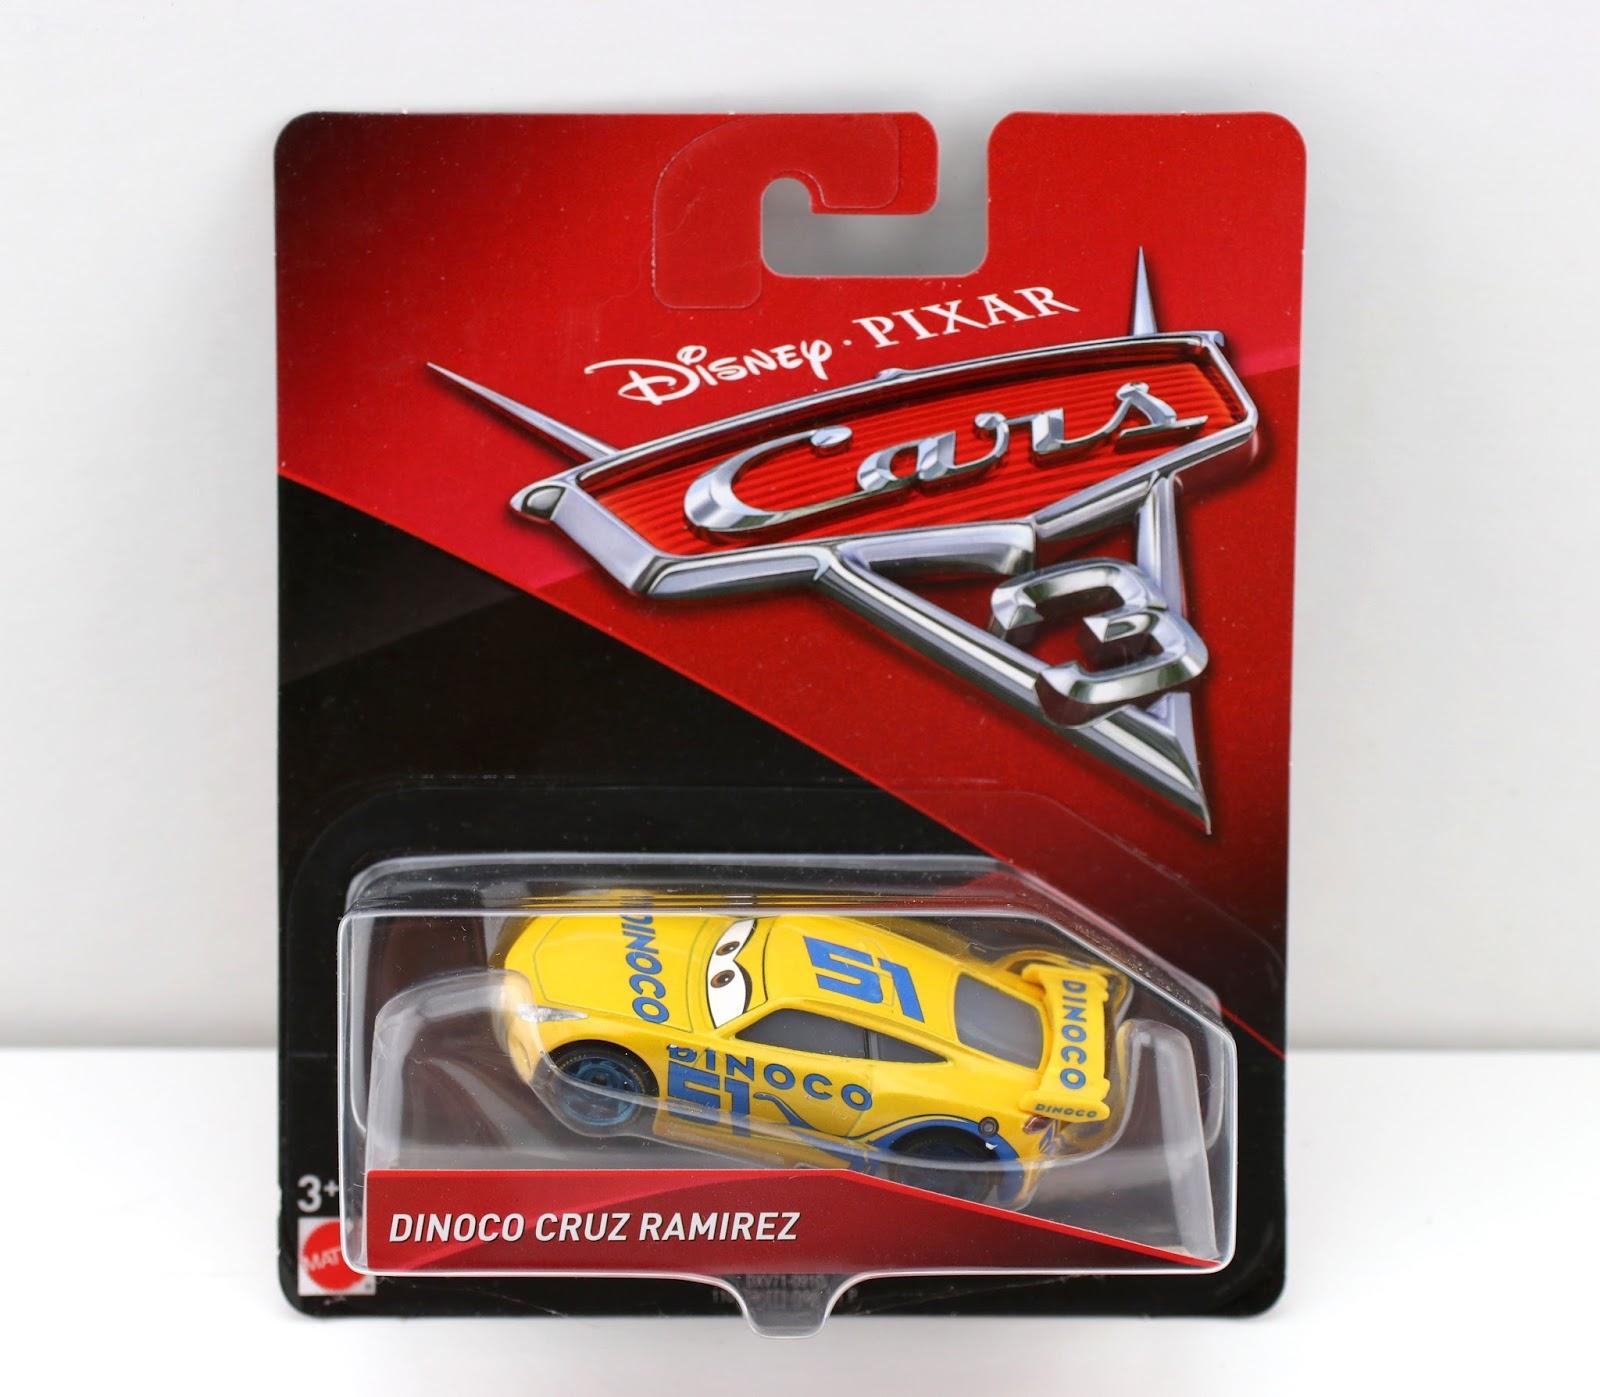 Cars 3 Dinoco Cruz Ramirez mattel diecast